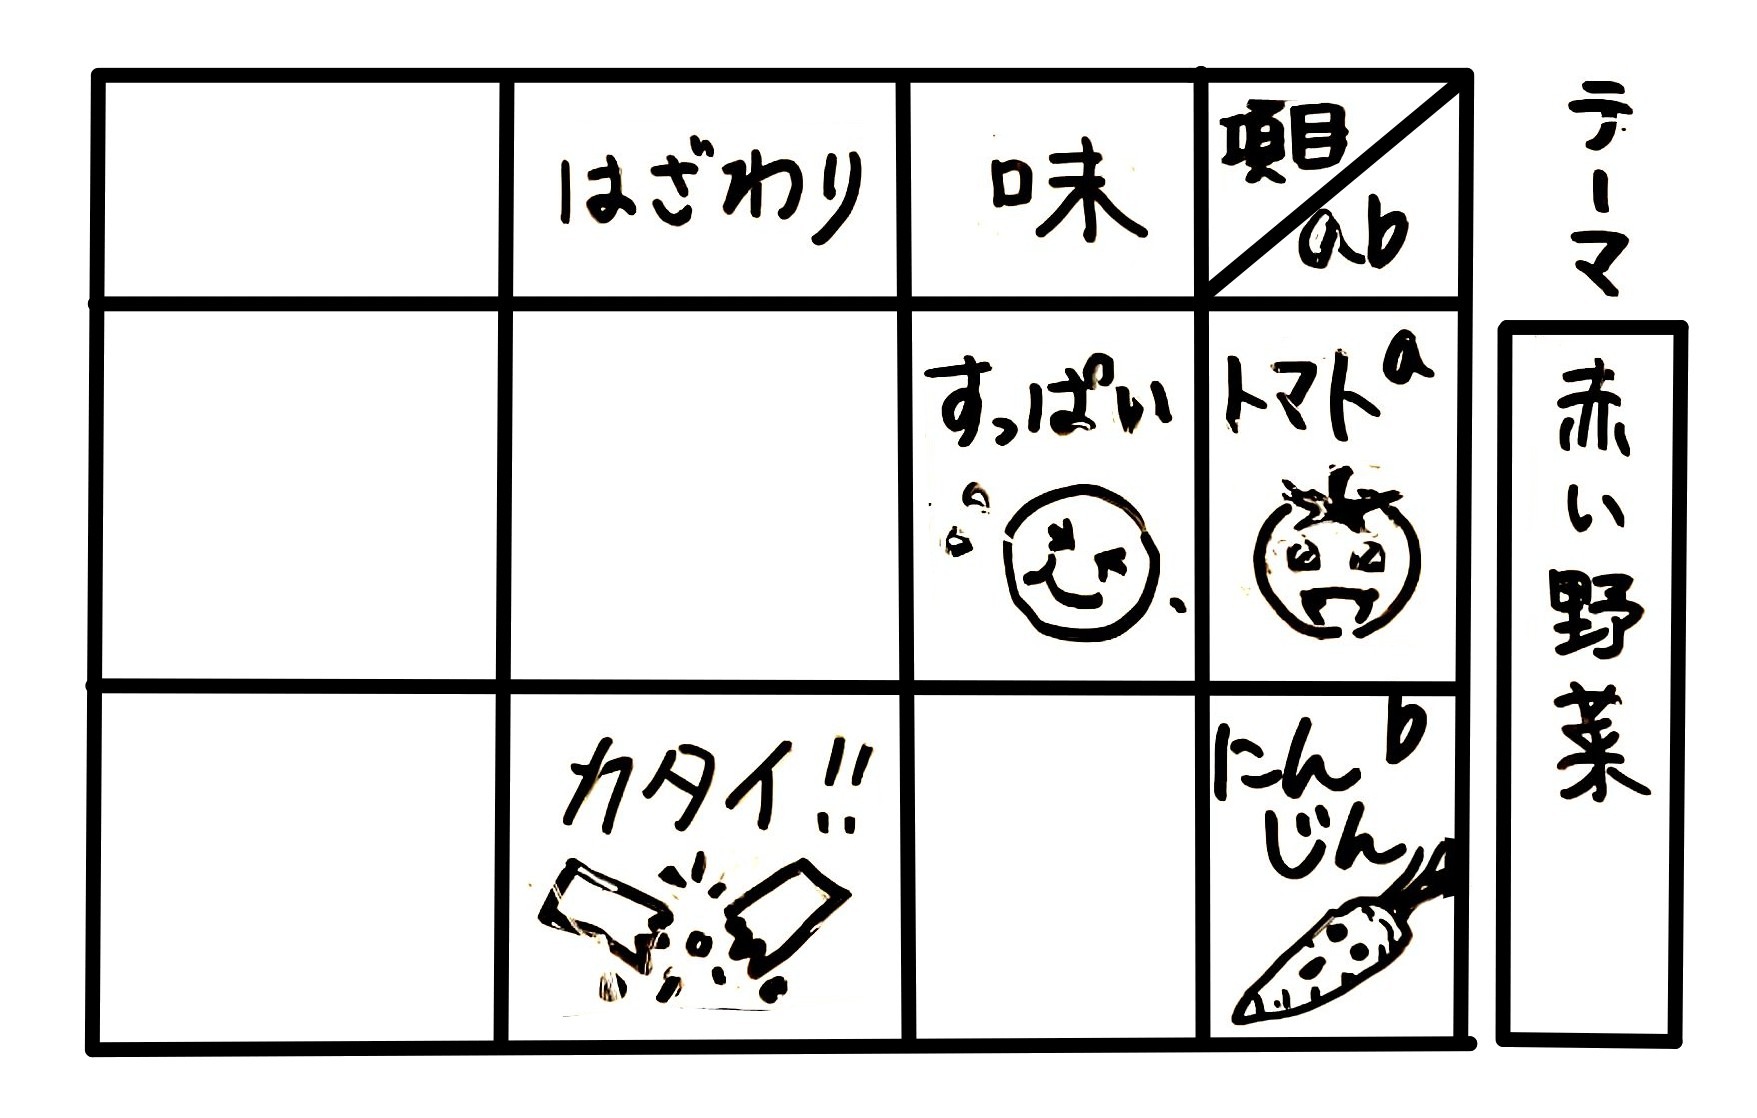 作成途中の対比作文(対比表)